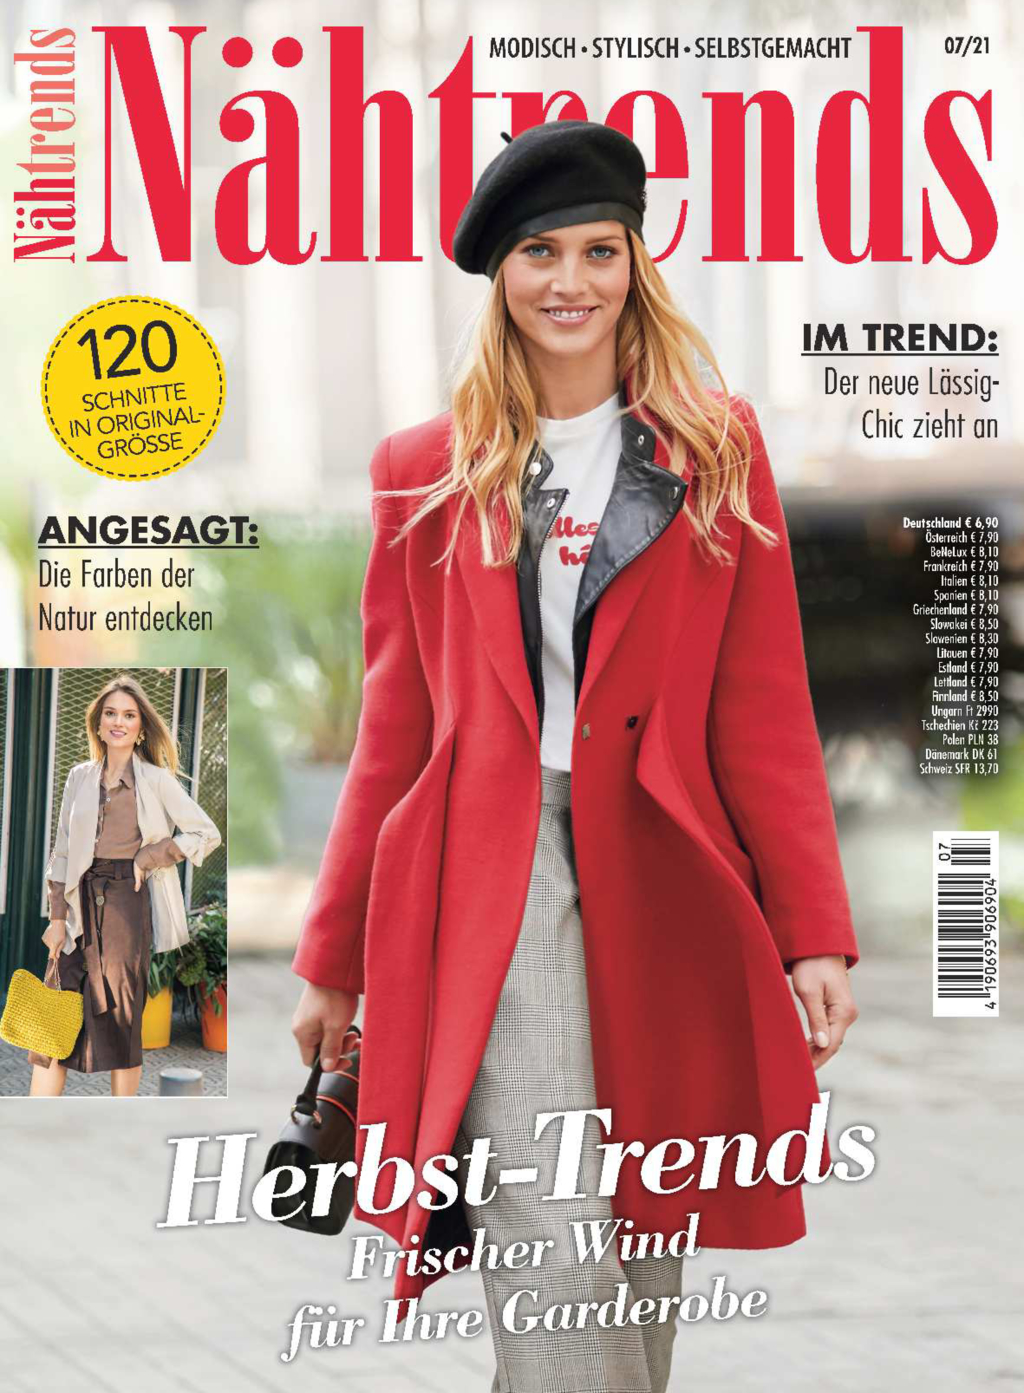 Nähtrends Nr. 07/2021 - Herbst-Trends